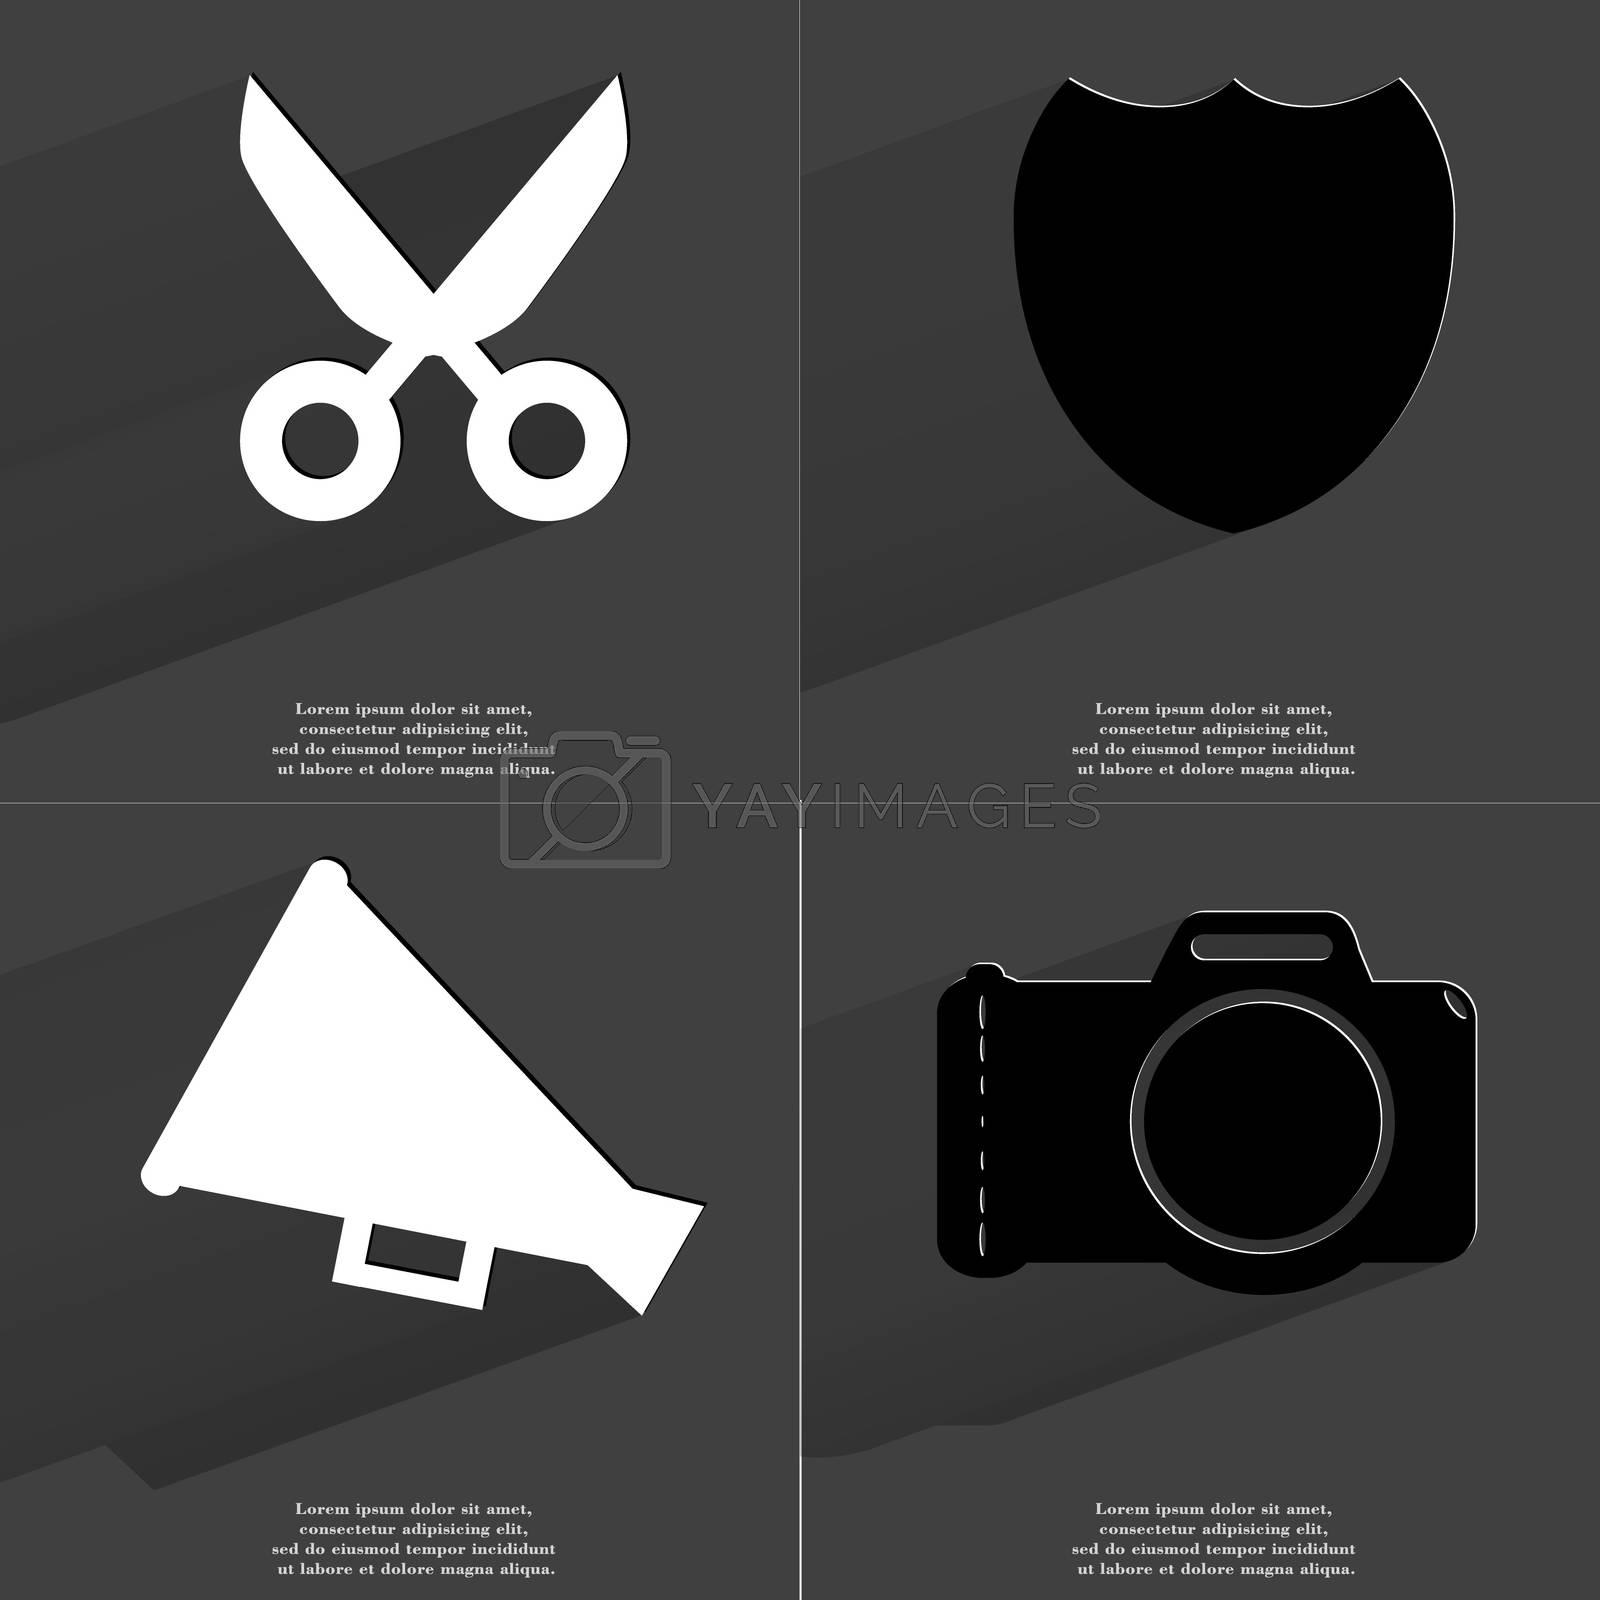 Royalty free image of Scissors, Badge, Megaphone, Camera. Symbols with long shadow. Flat design by serhii_lohvyniuk